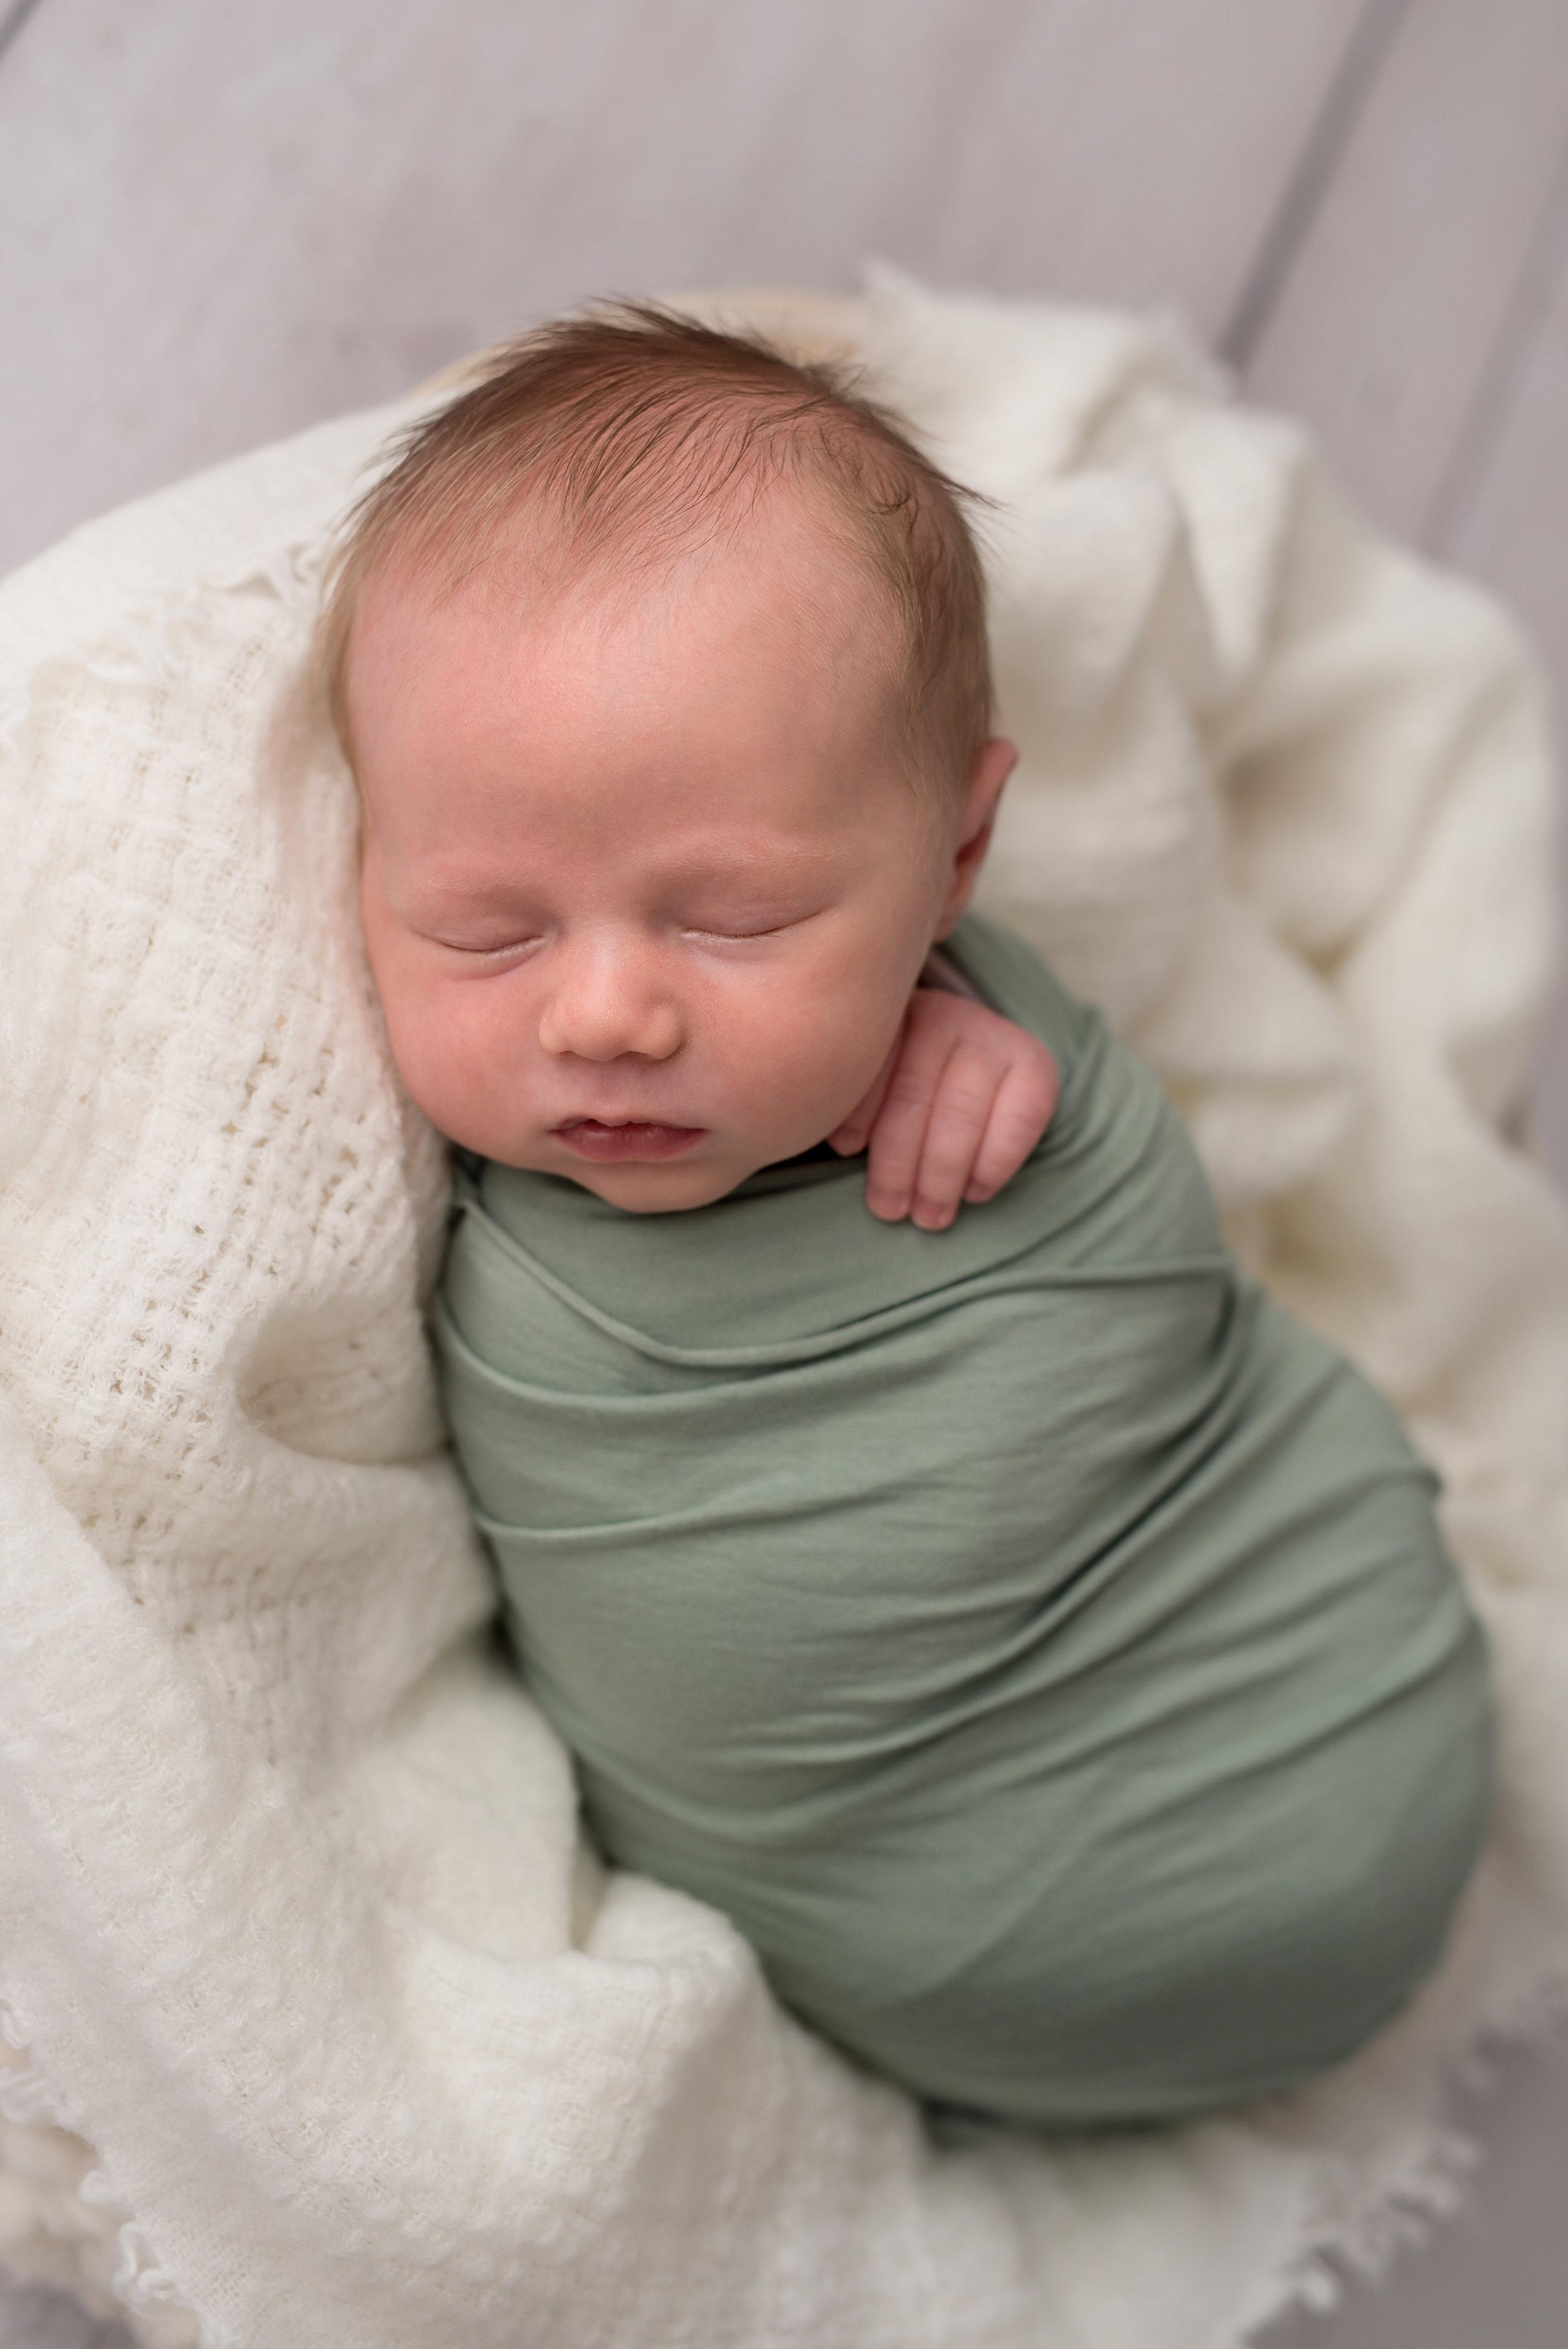 James-Island-Newborn-Photographer-Following-Seas-Photography-FSP_1500 copy.jpg